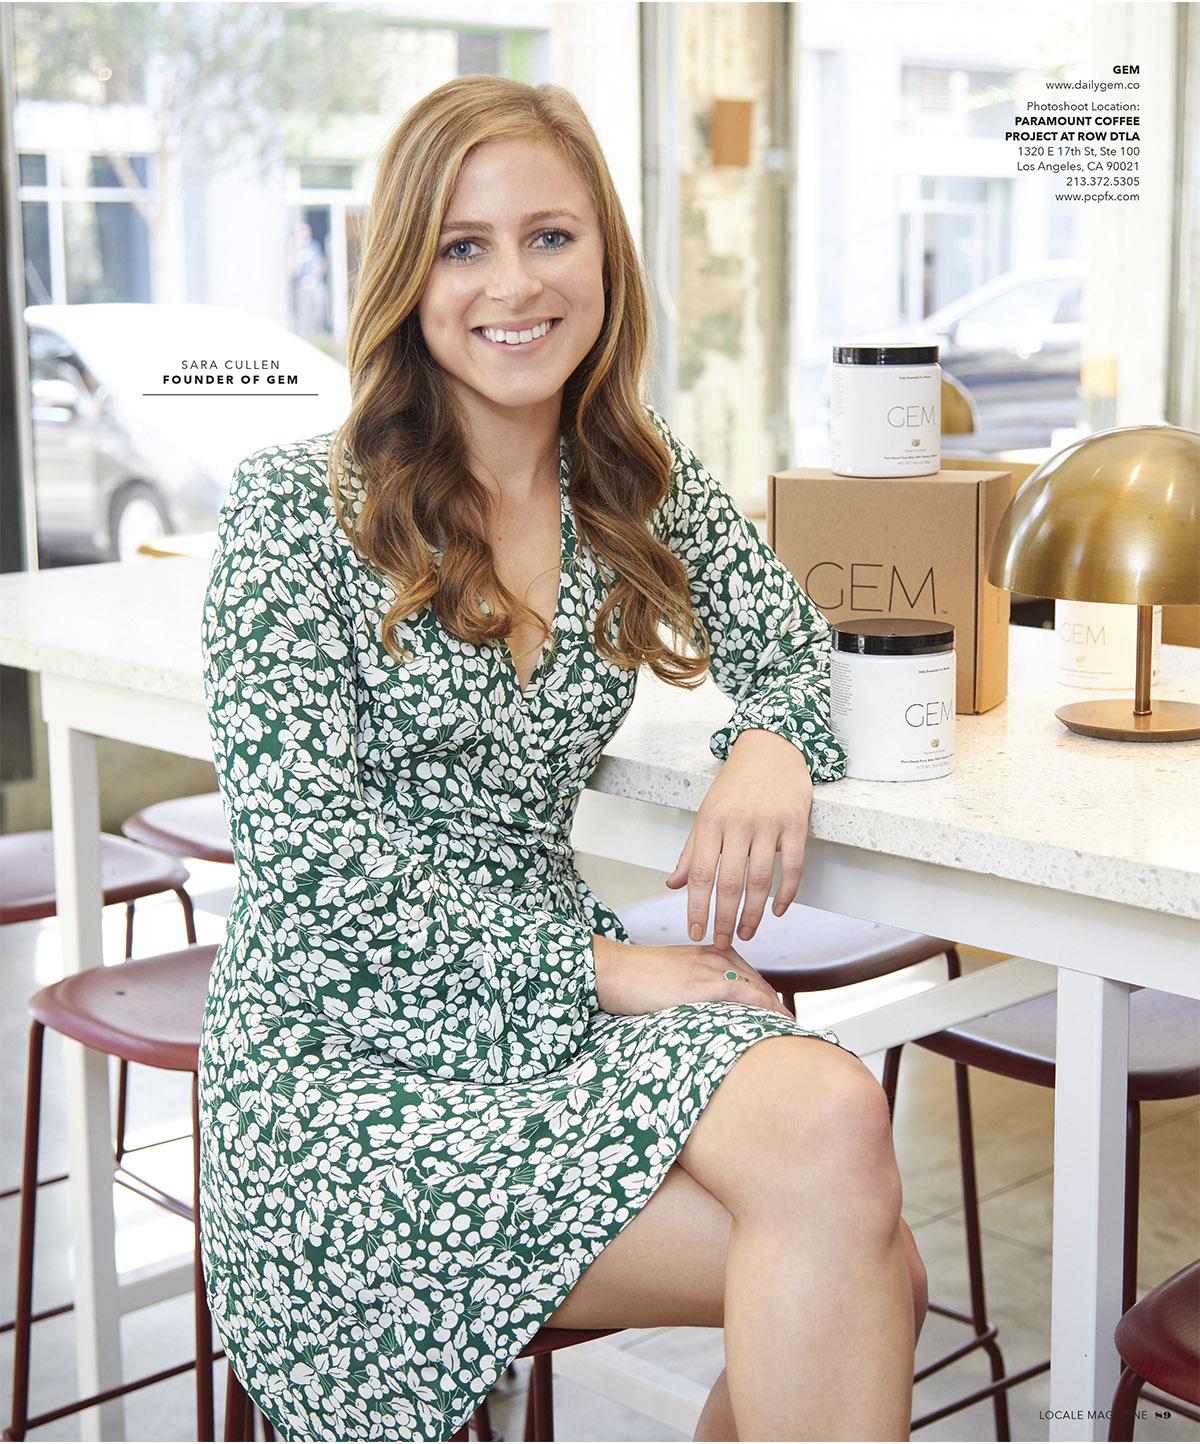 Sara Cullen: Founder of GEM (vitamins)